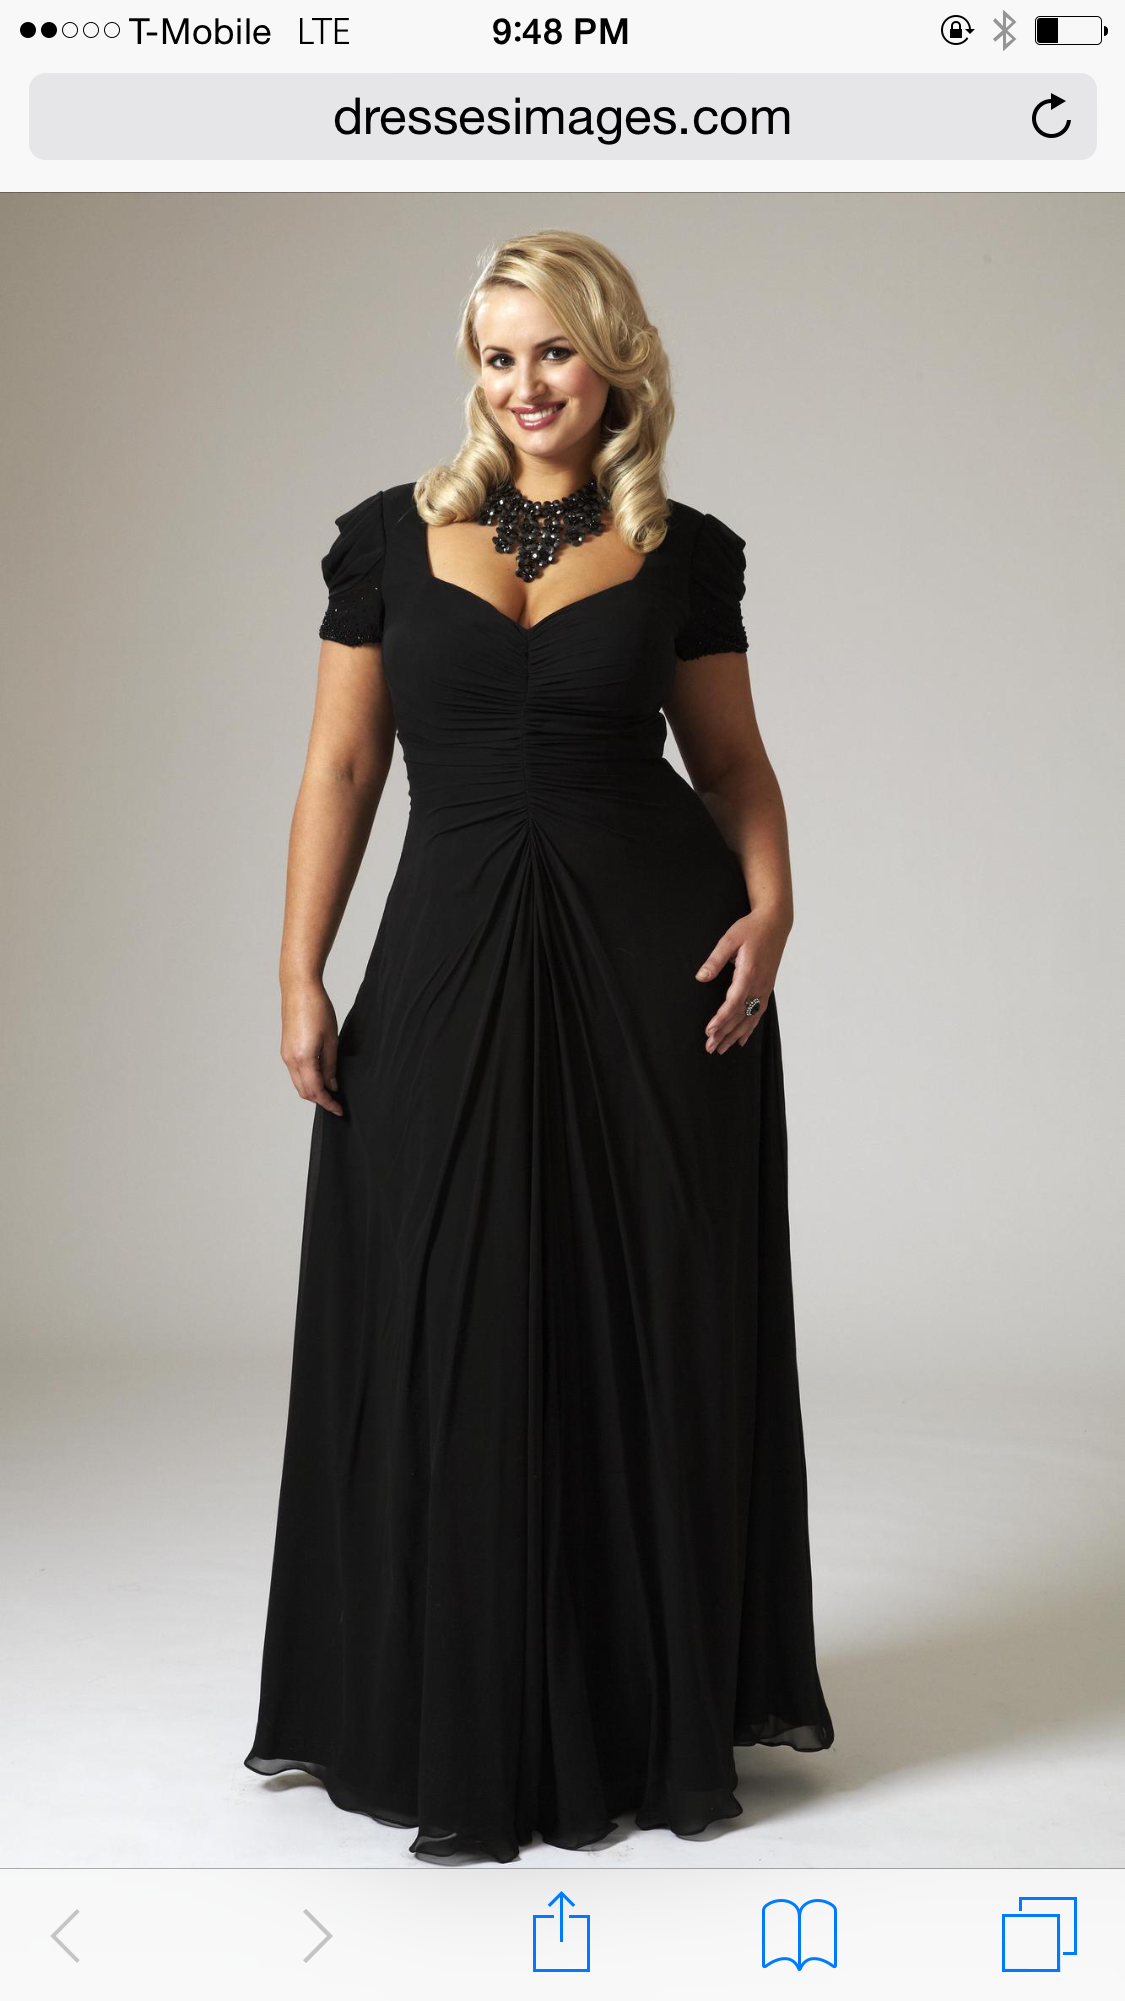 Pin By Joy Beyda On Fashionation Evening Dresses Plus Size Bridesmaid Dresses Plus Size Plus Size Gowns [ 2001 x 1125 Pixel ]